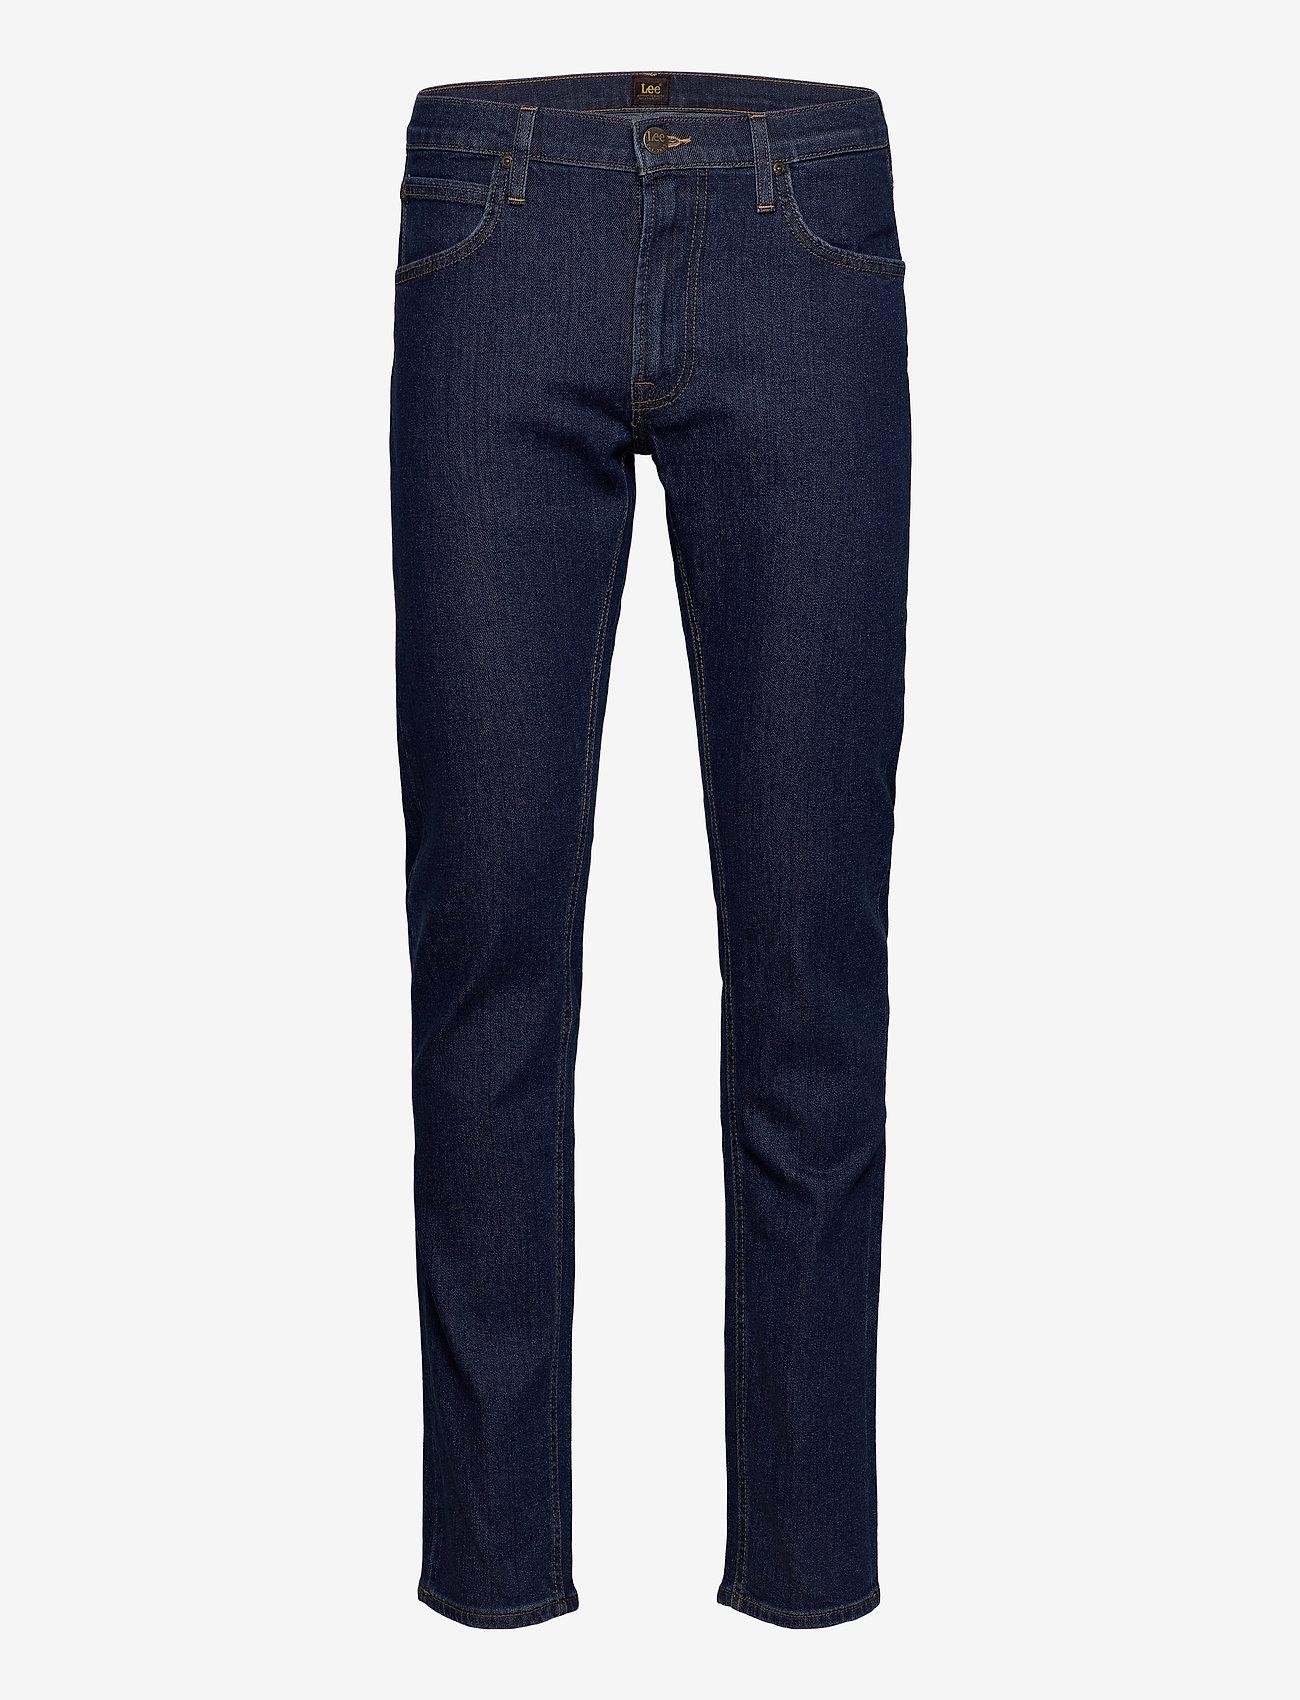 Lee Jeans - DAREN ZIP FLY - regular jeans - dark stonewash - 0